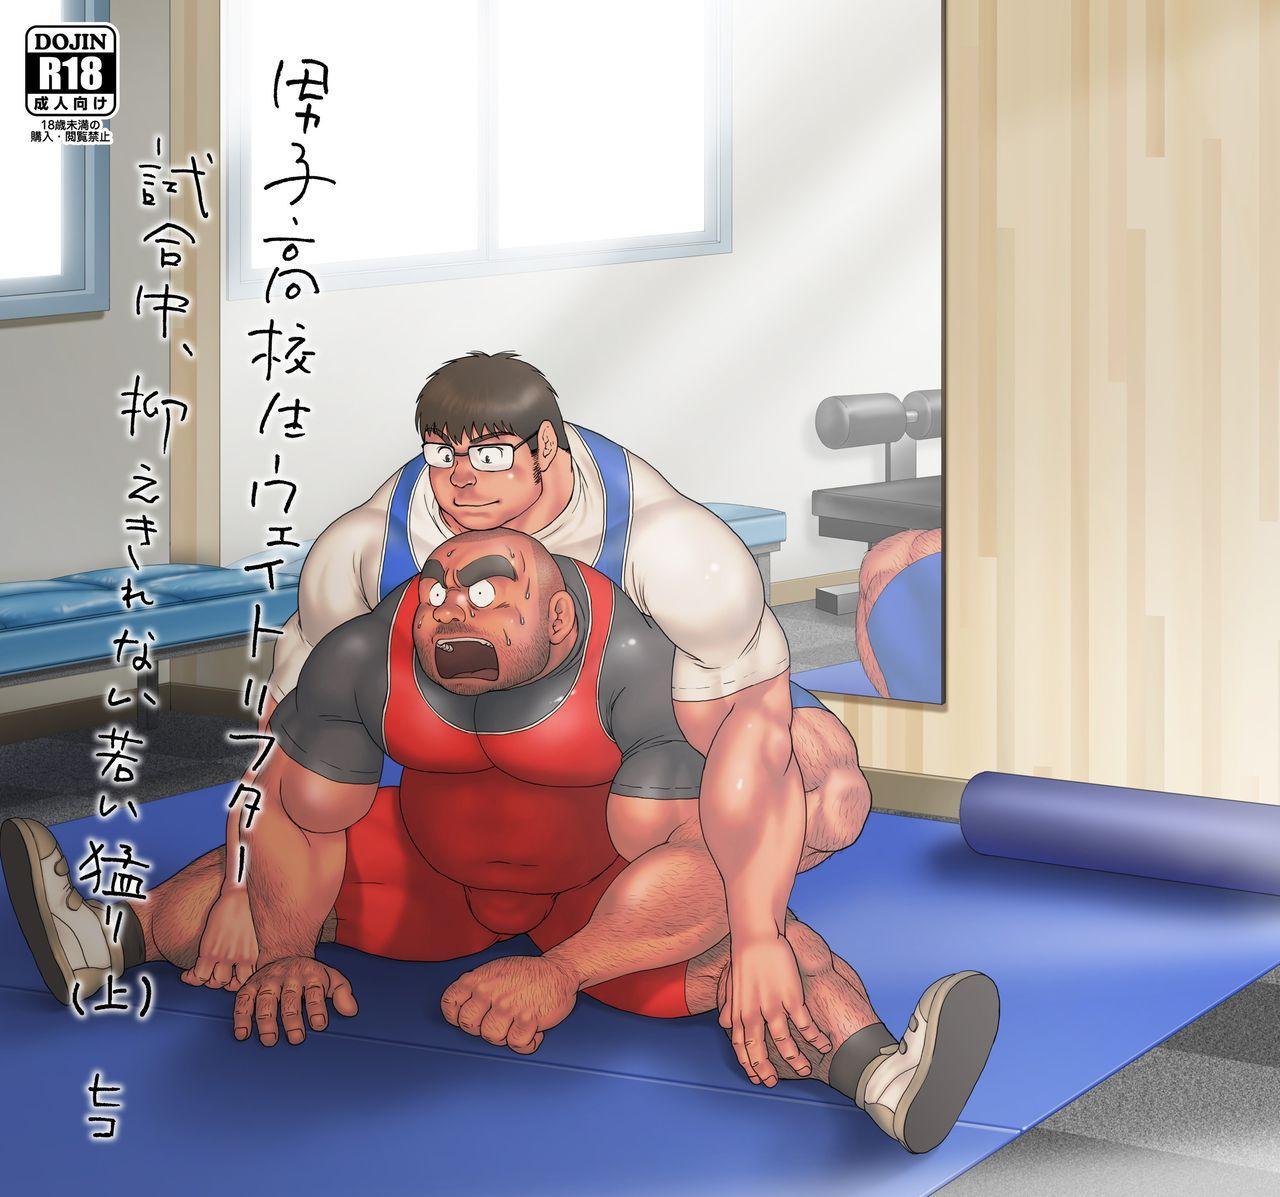 Danshi Koukousei Weightlifter Shiai-chuu, Osae kirenai Wakai Takeri 0